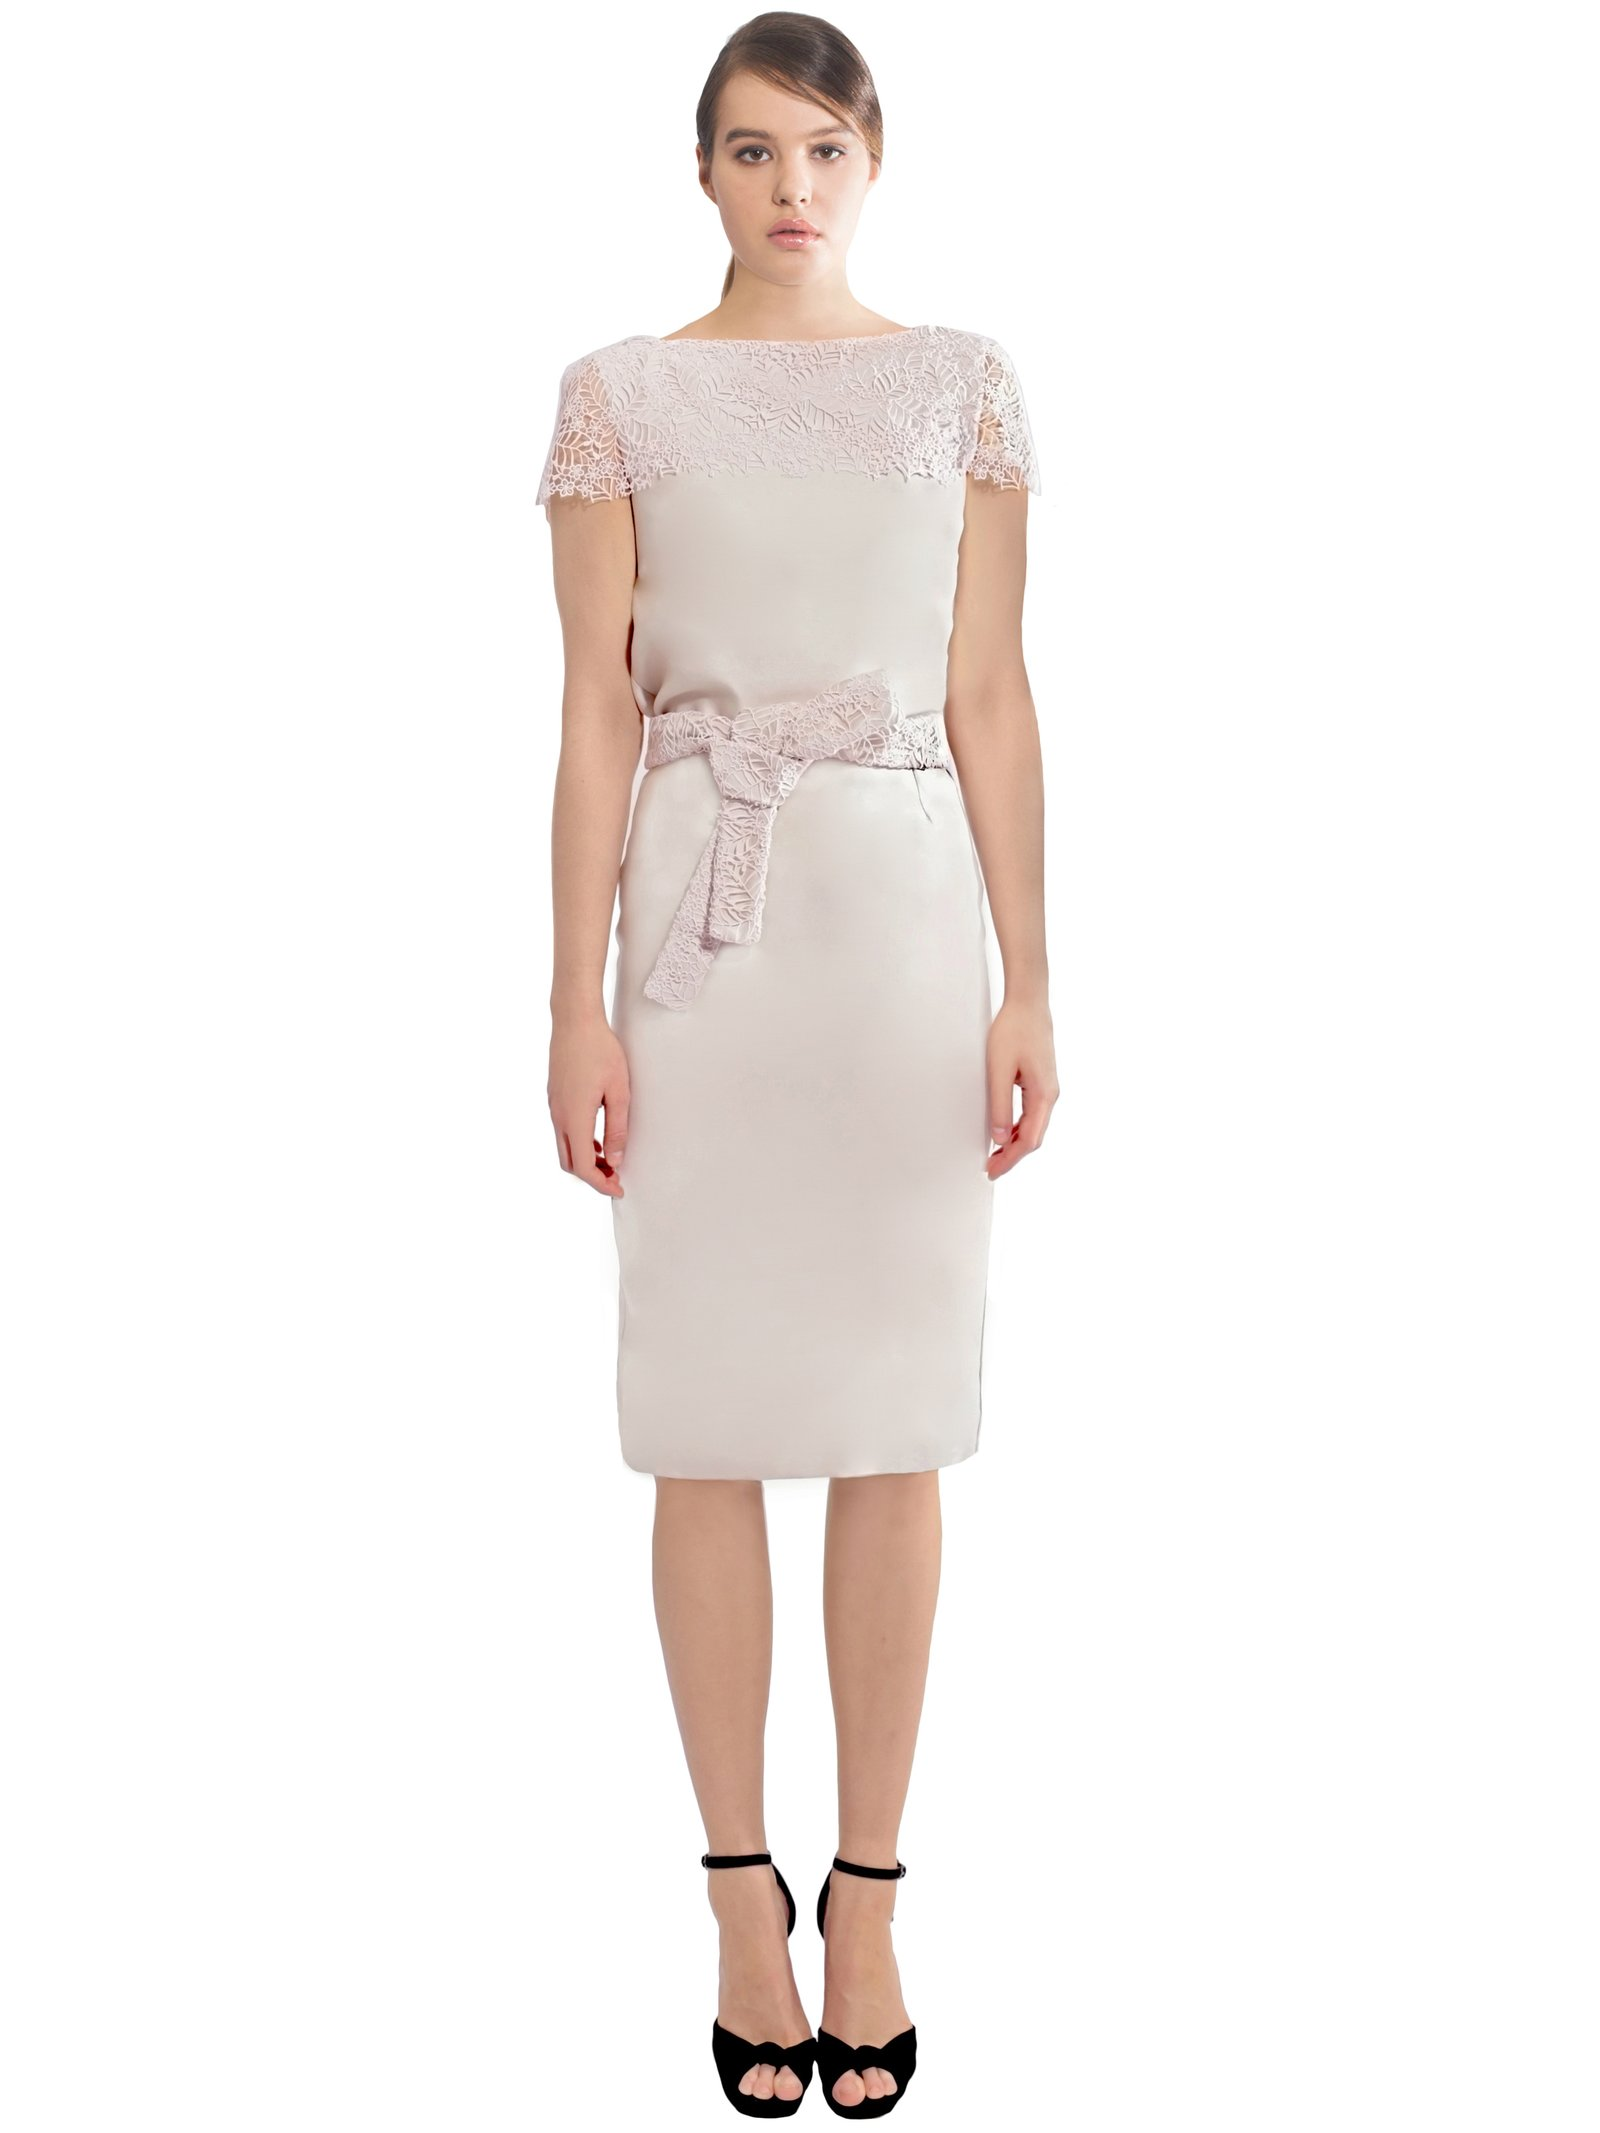 LIZA VETA Pencil Skirt With Floral Belt